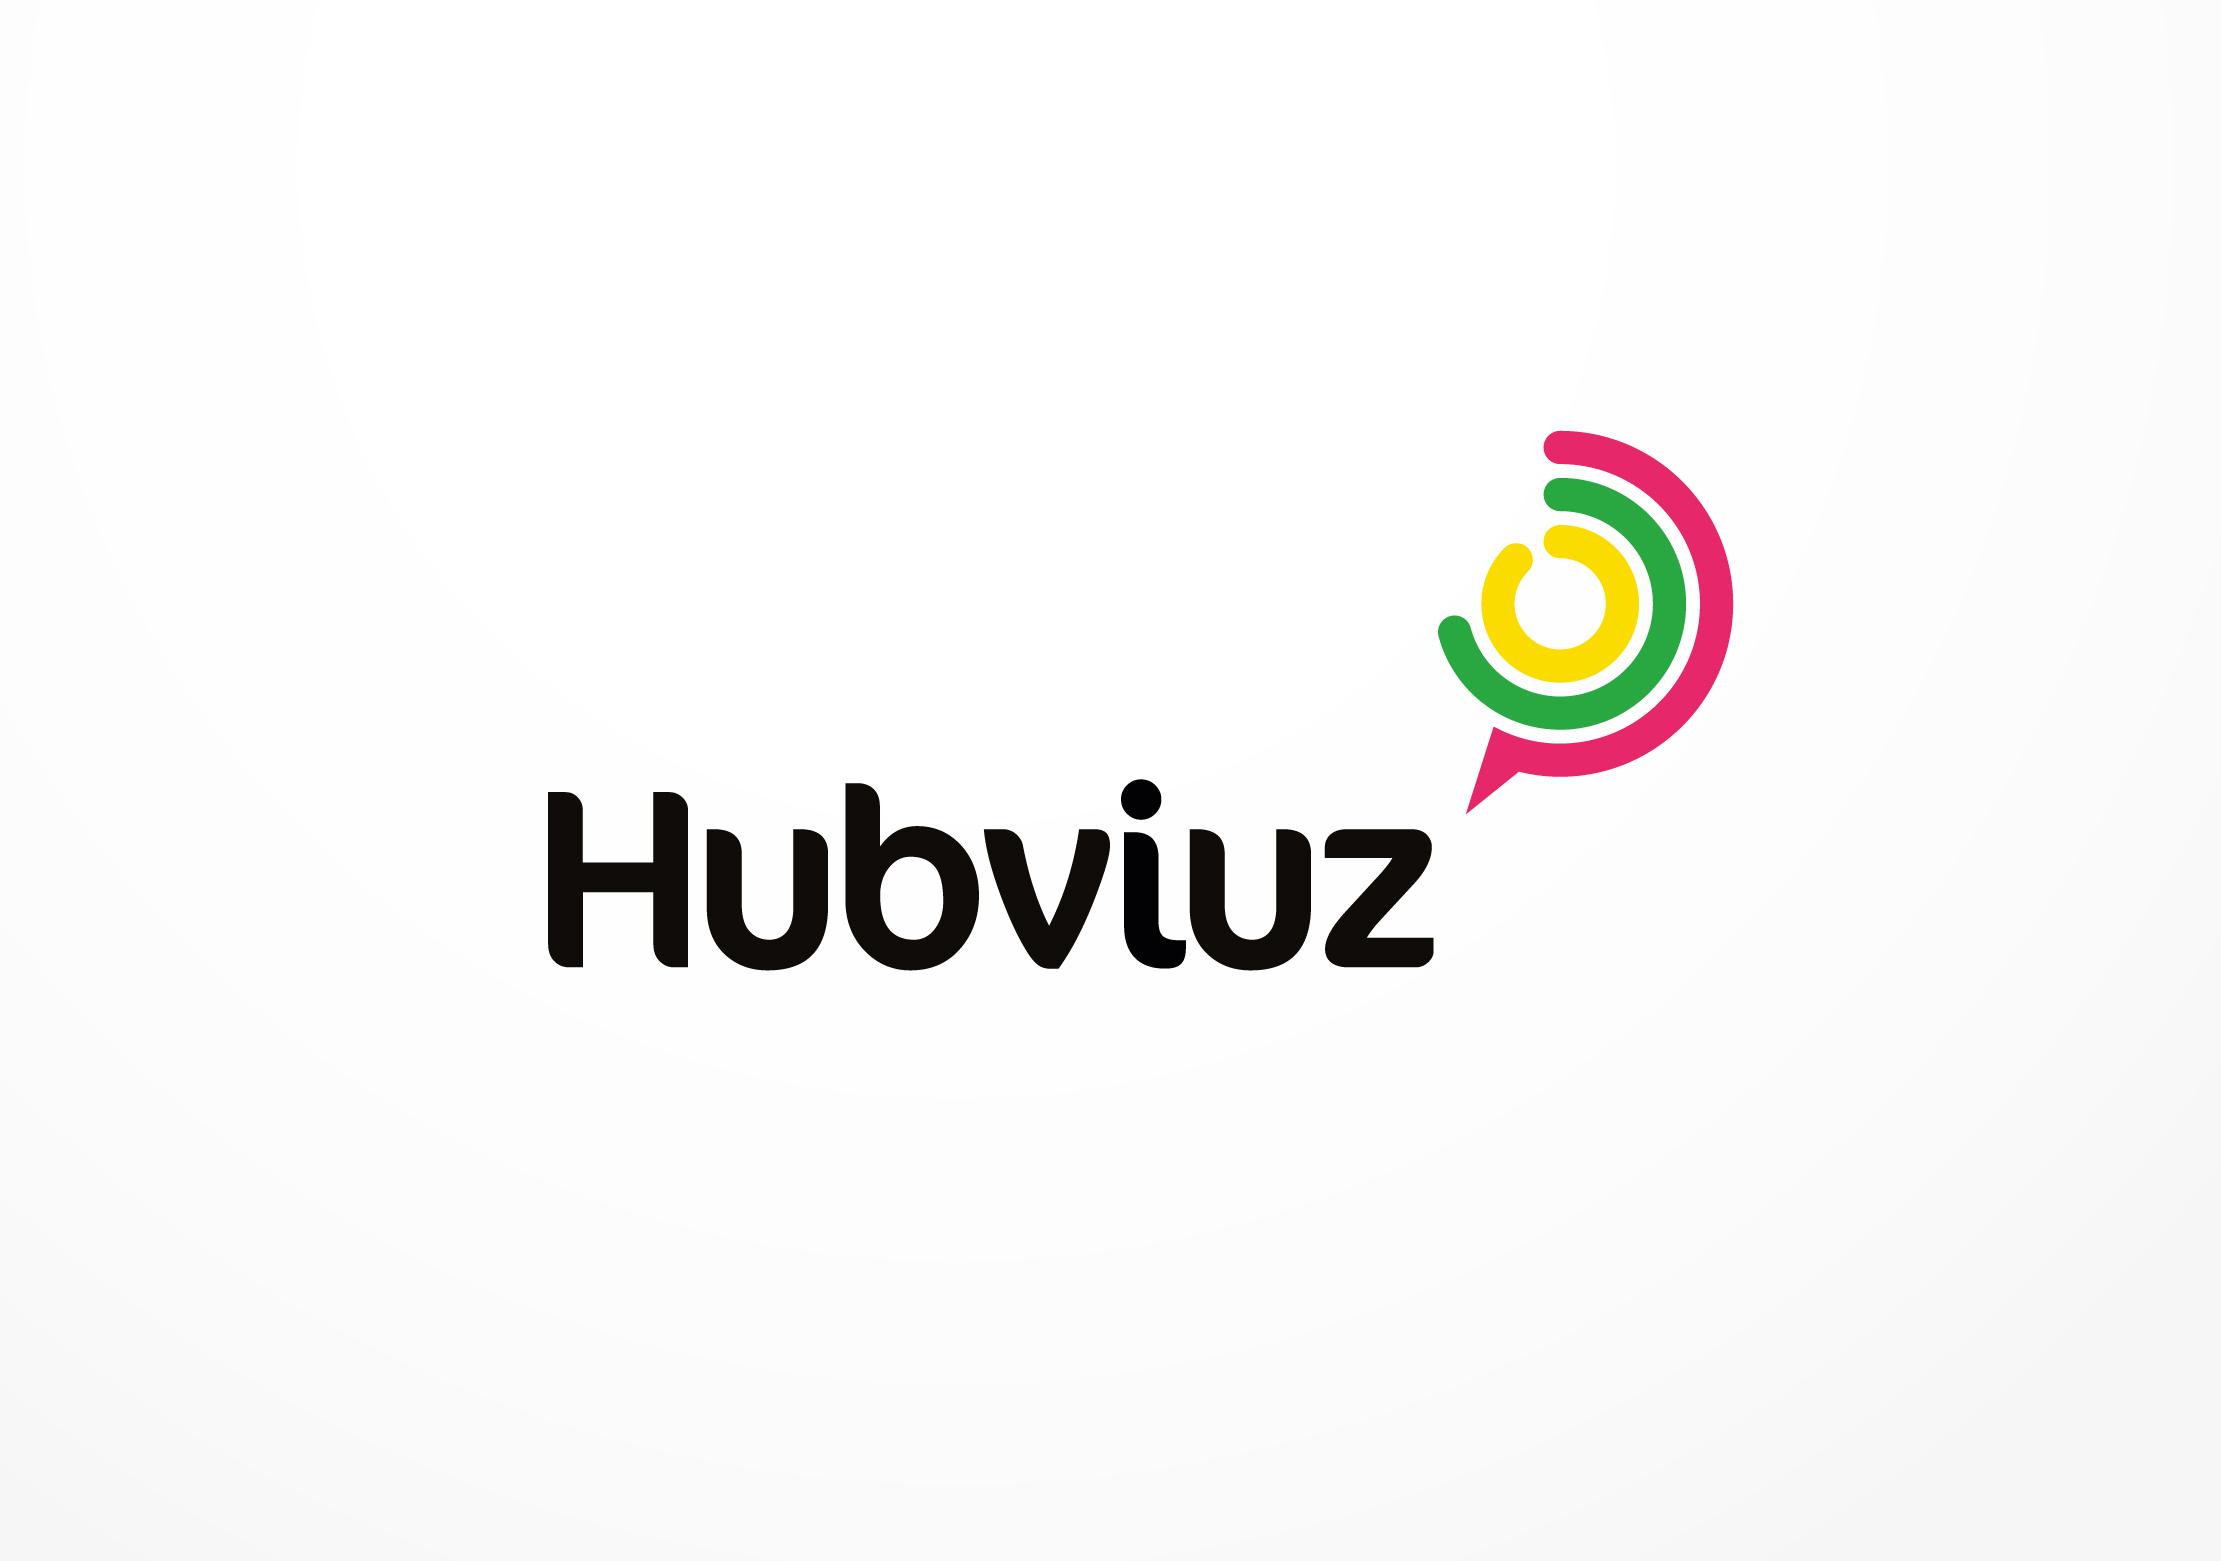 HUBVIUZ